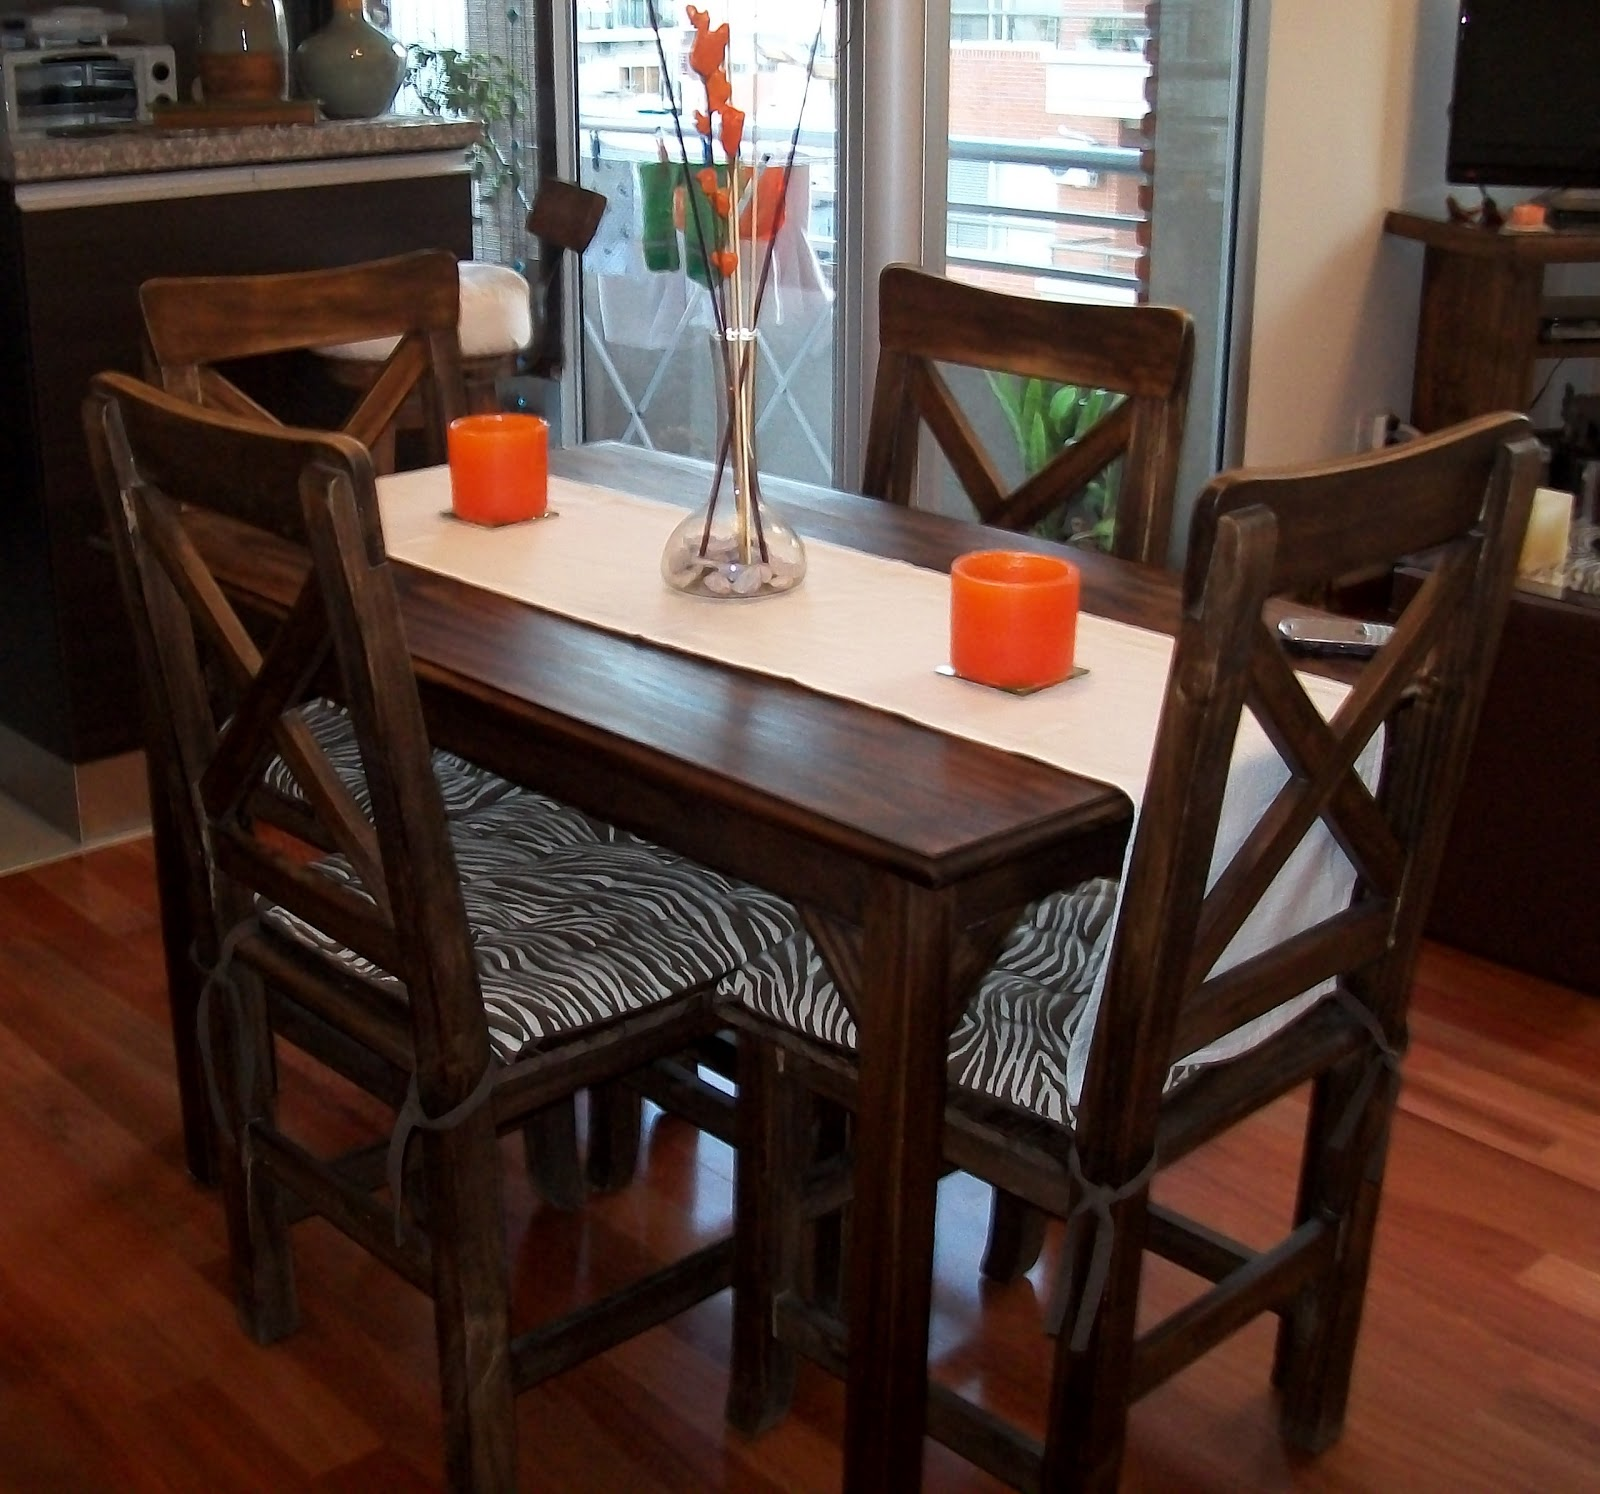 Decoracion y dise o living comedor dpto 2 ambientes for Decoracion living departamento 2 ambientes